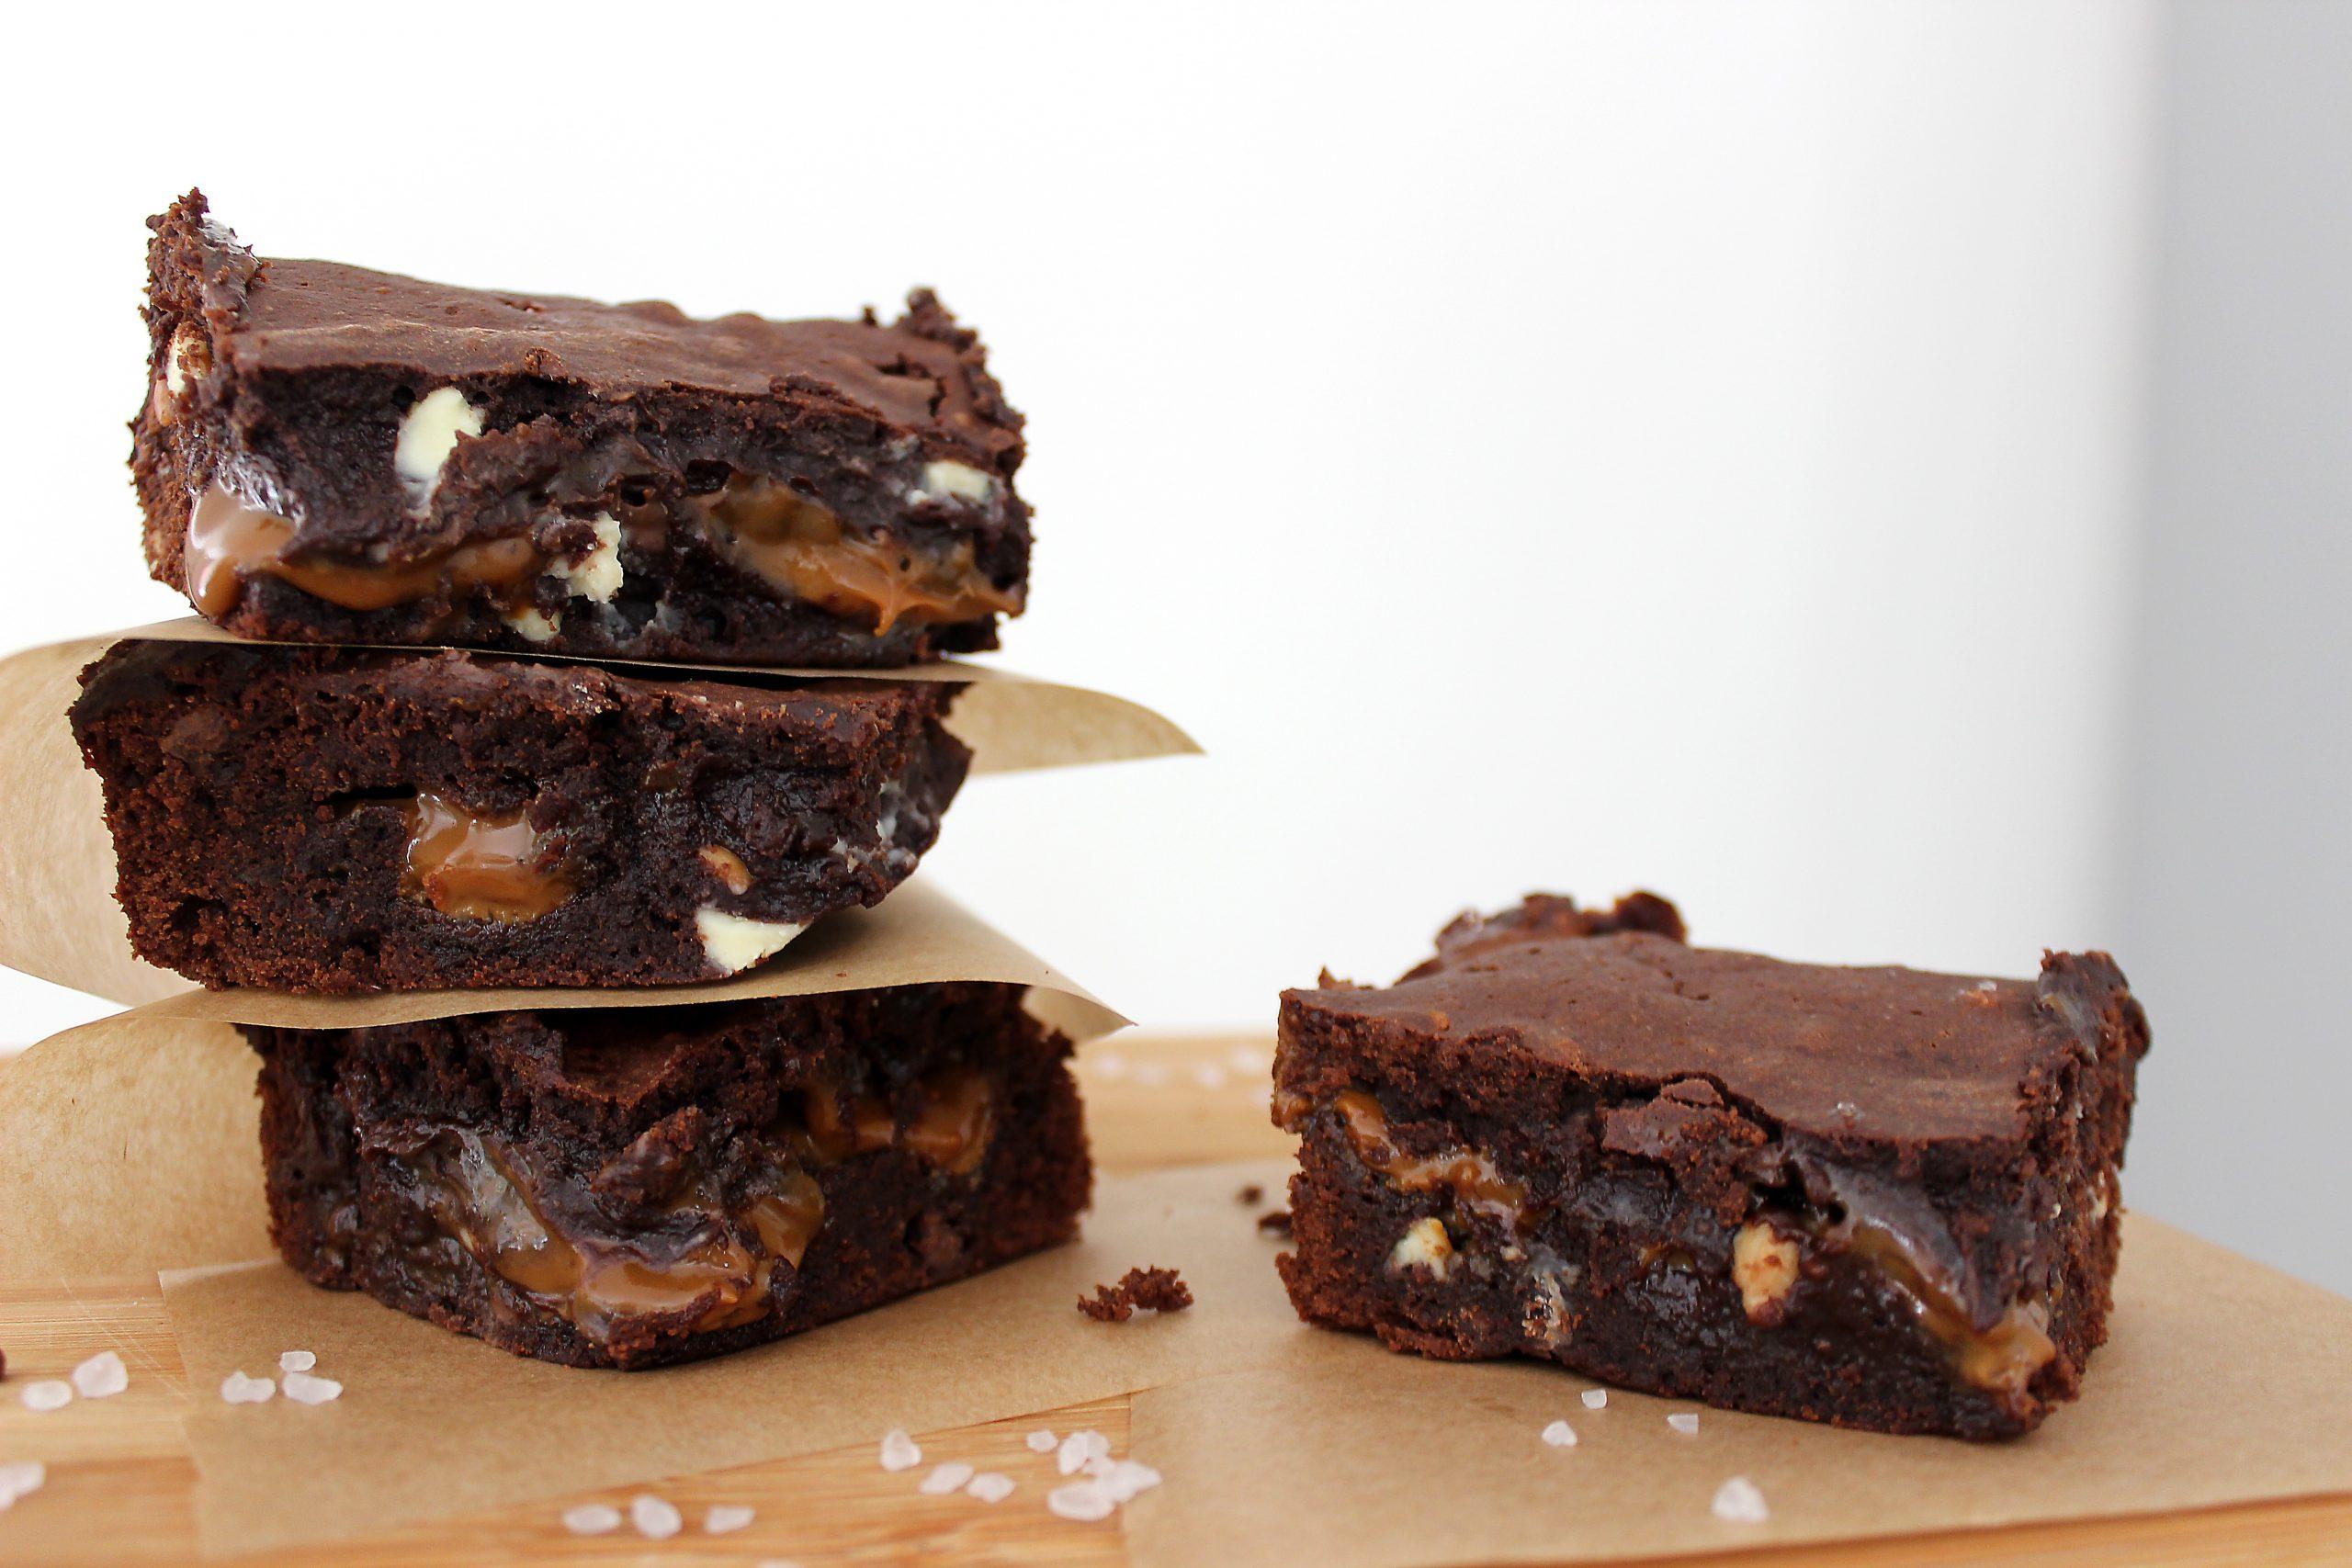 Salted Caramel Peanut Butter Triple Chocolate Brownies